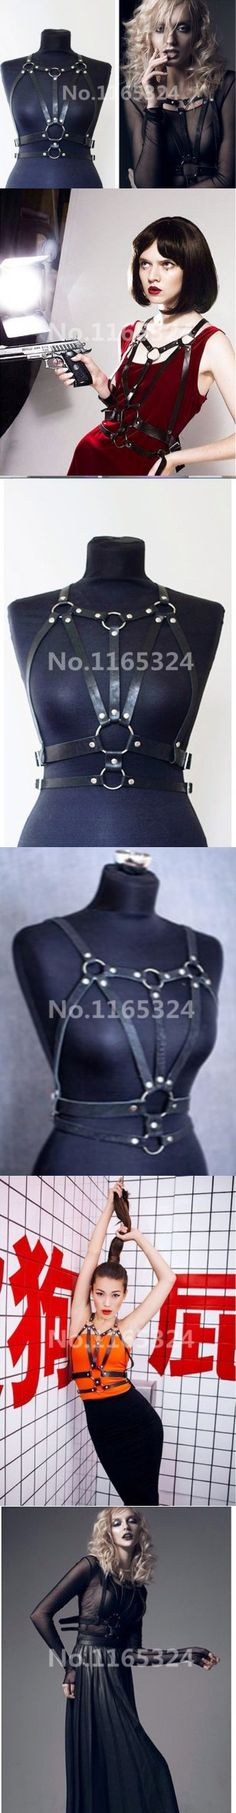 Cool Fashion Handmade Women Punk Gothic Leather Harness Body Bondage Cage Bustier Corset Sculpting Chest Waist Belt